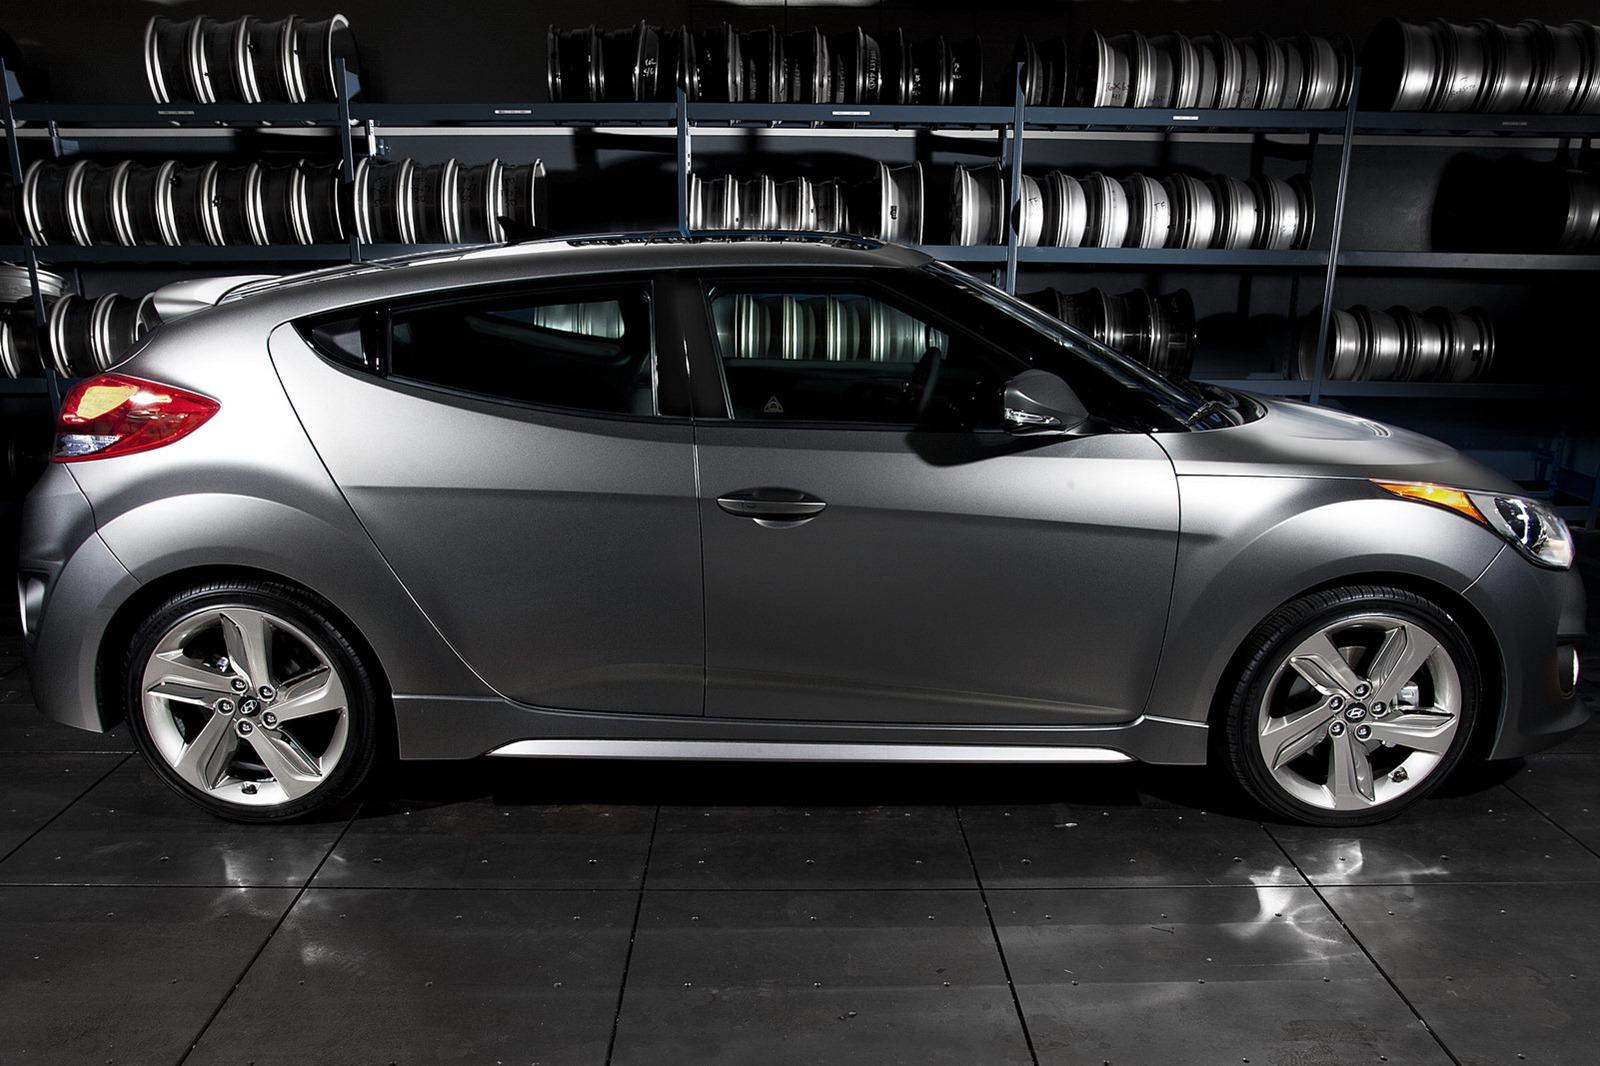 2013 Hyundai Veloster Gains Turbo Package     - VWVortex com